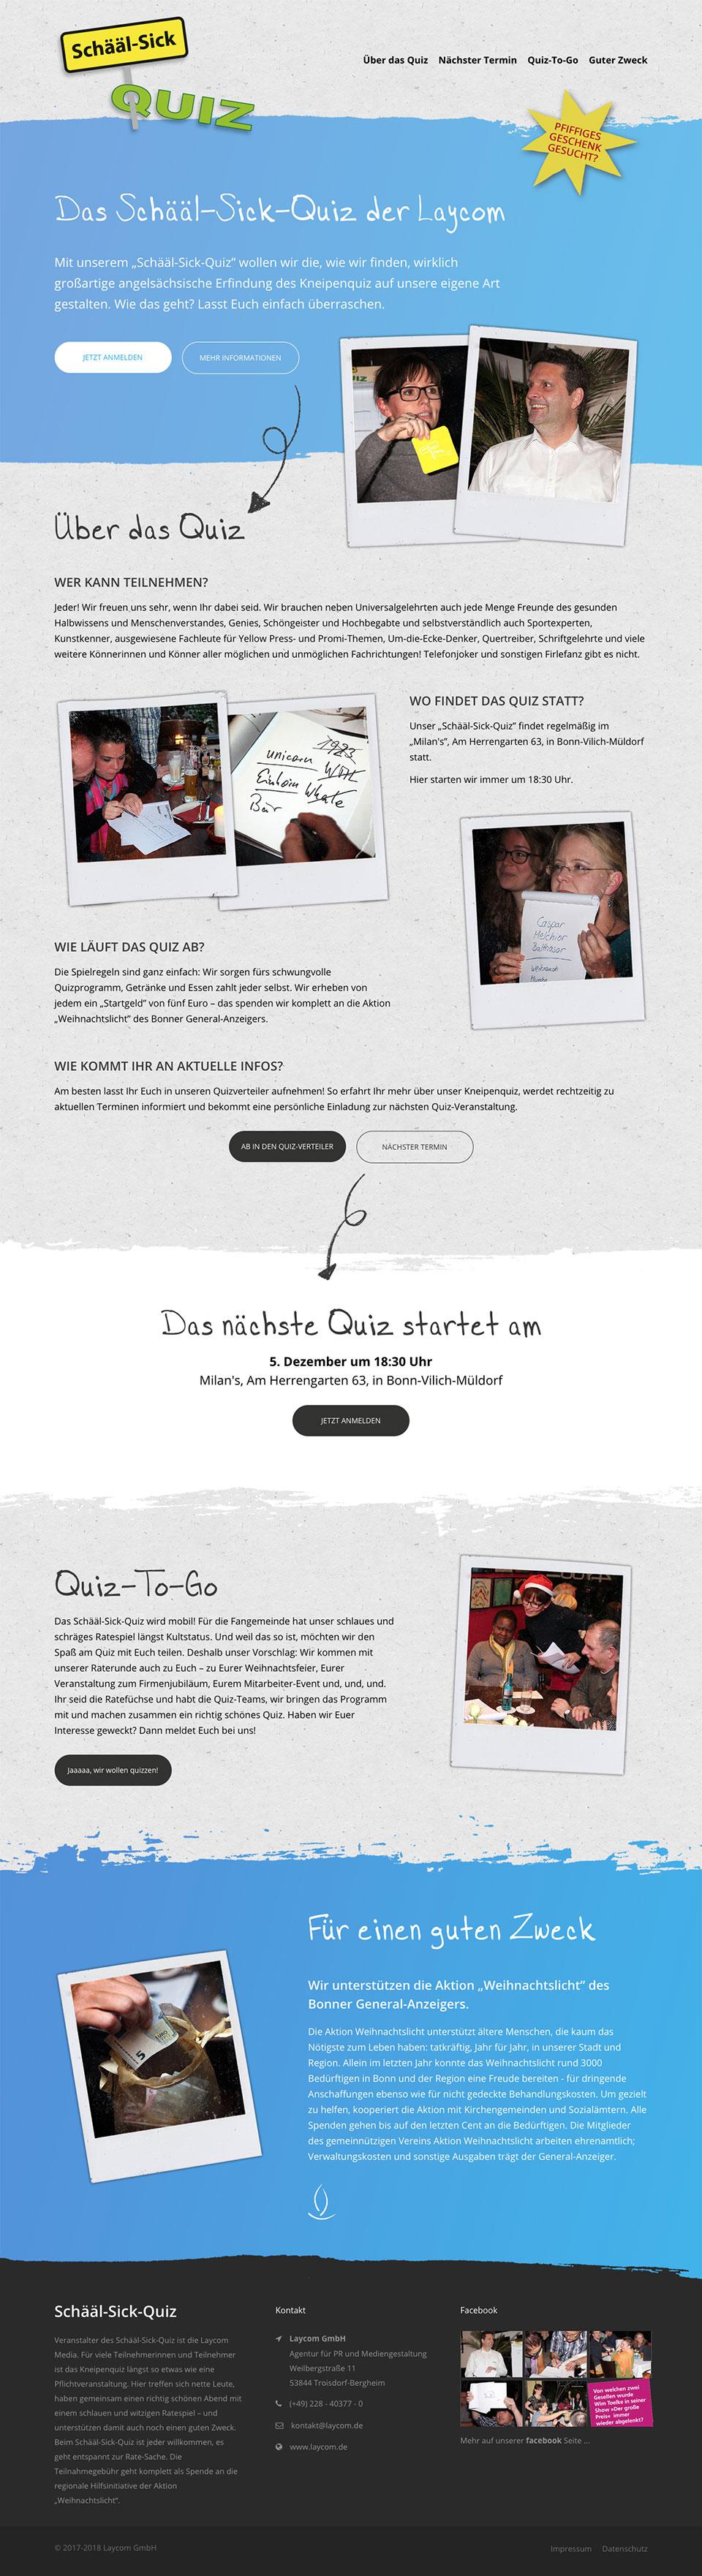 schääl-sick-quiz-image-1